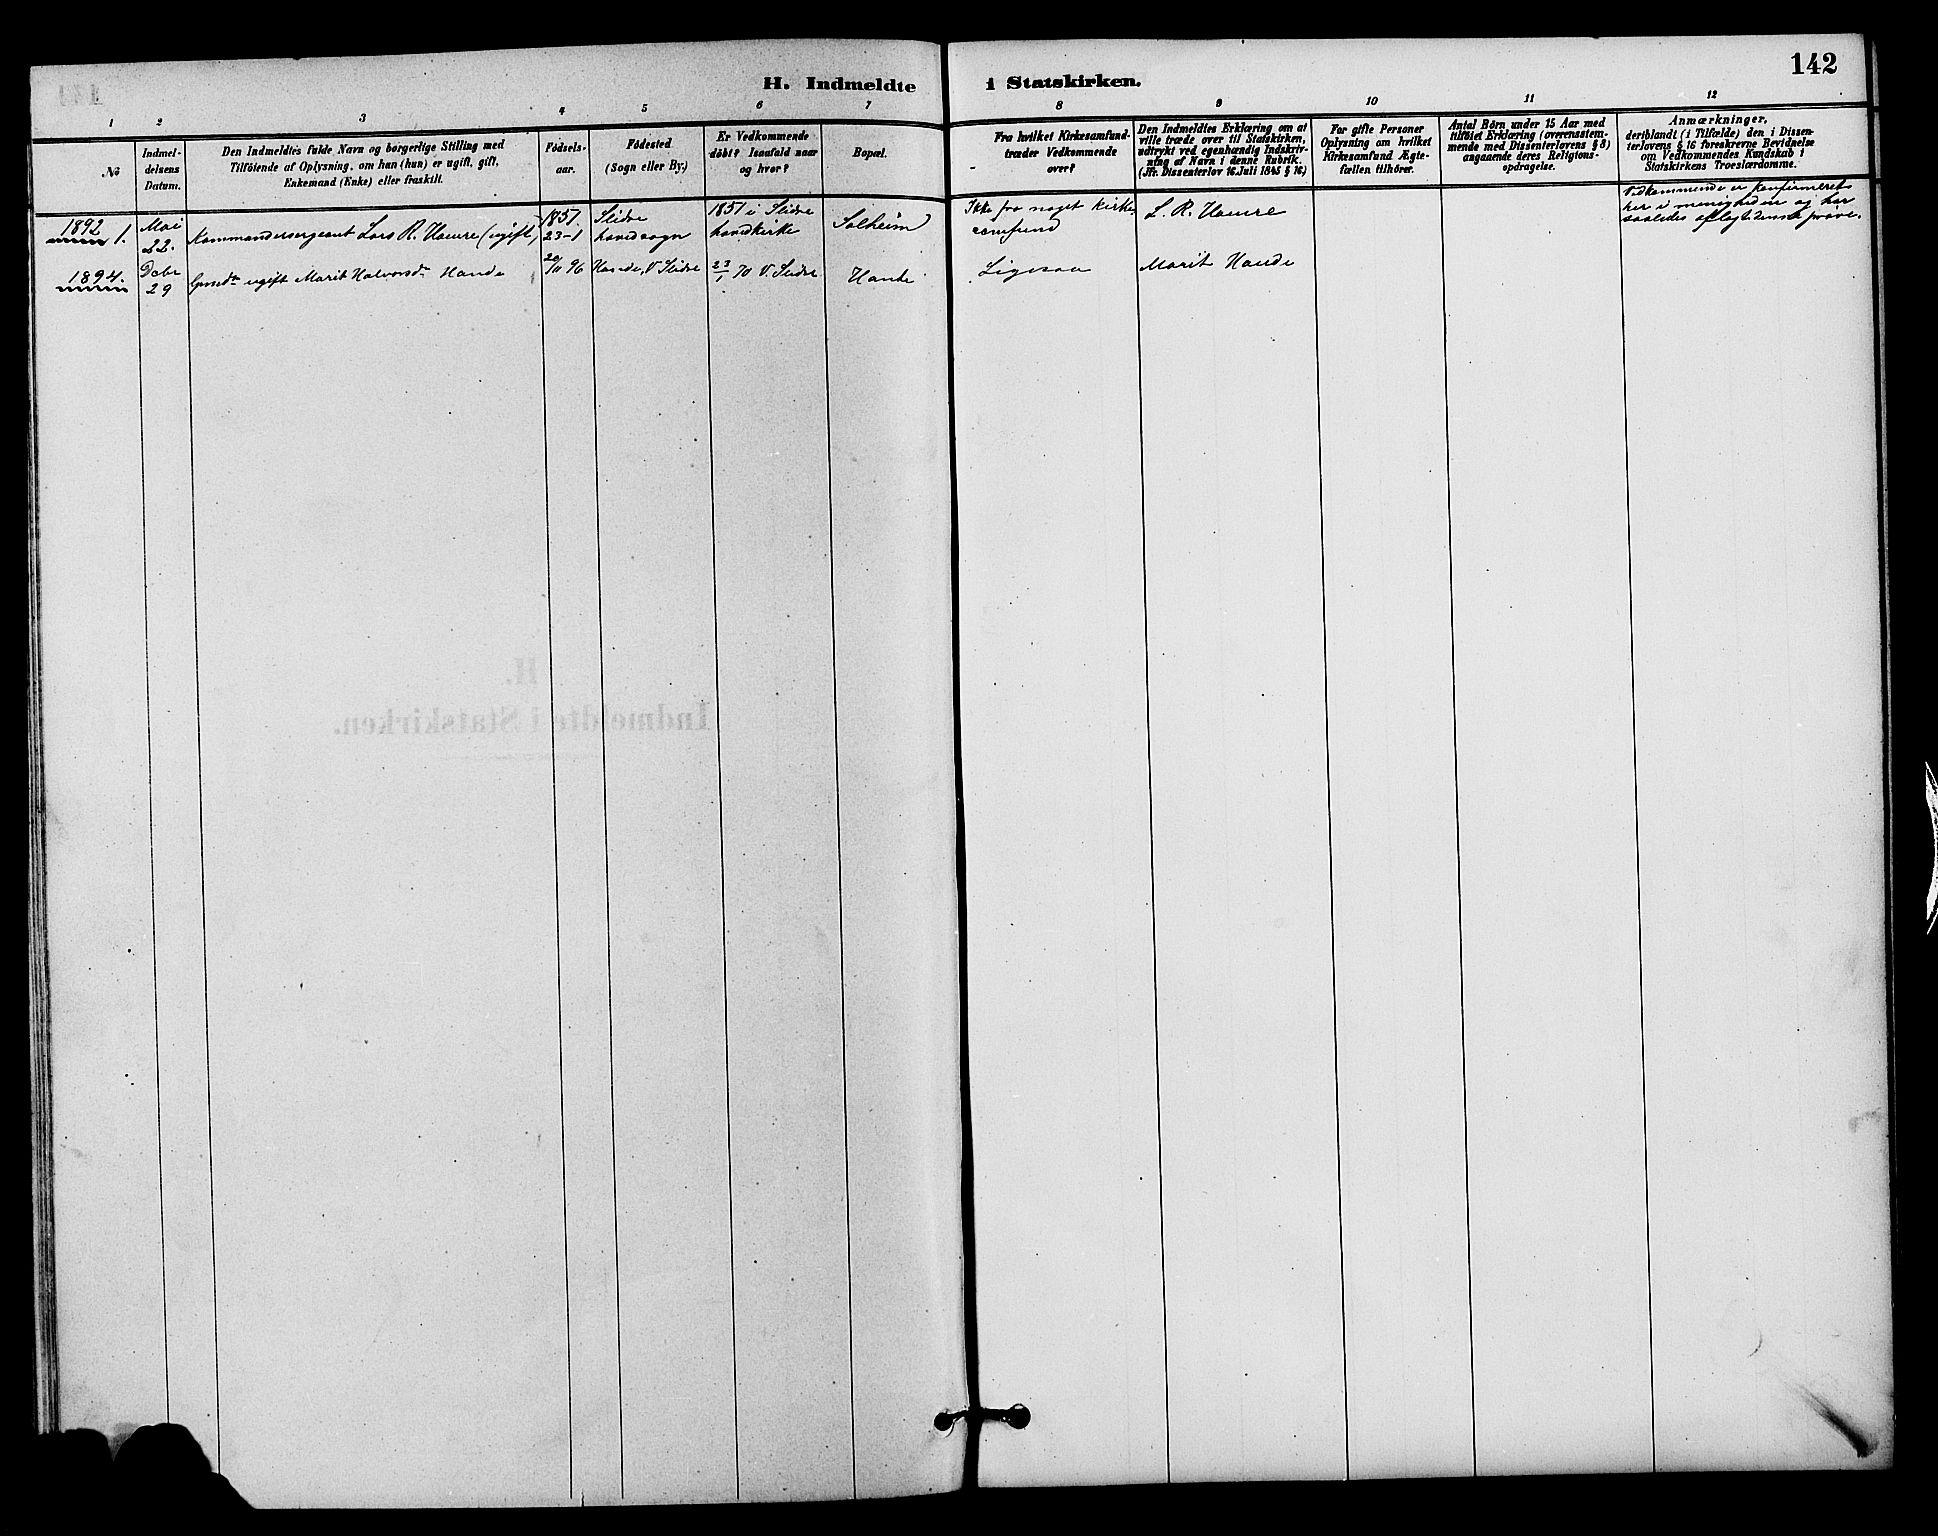 SAH, Vestre Slidre prestekontor, Klokkerbok nr. 4, 1881-1912, s. 142